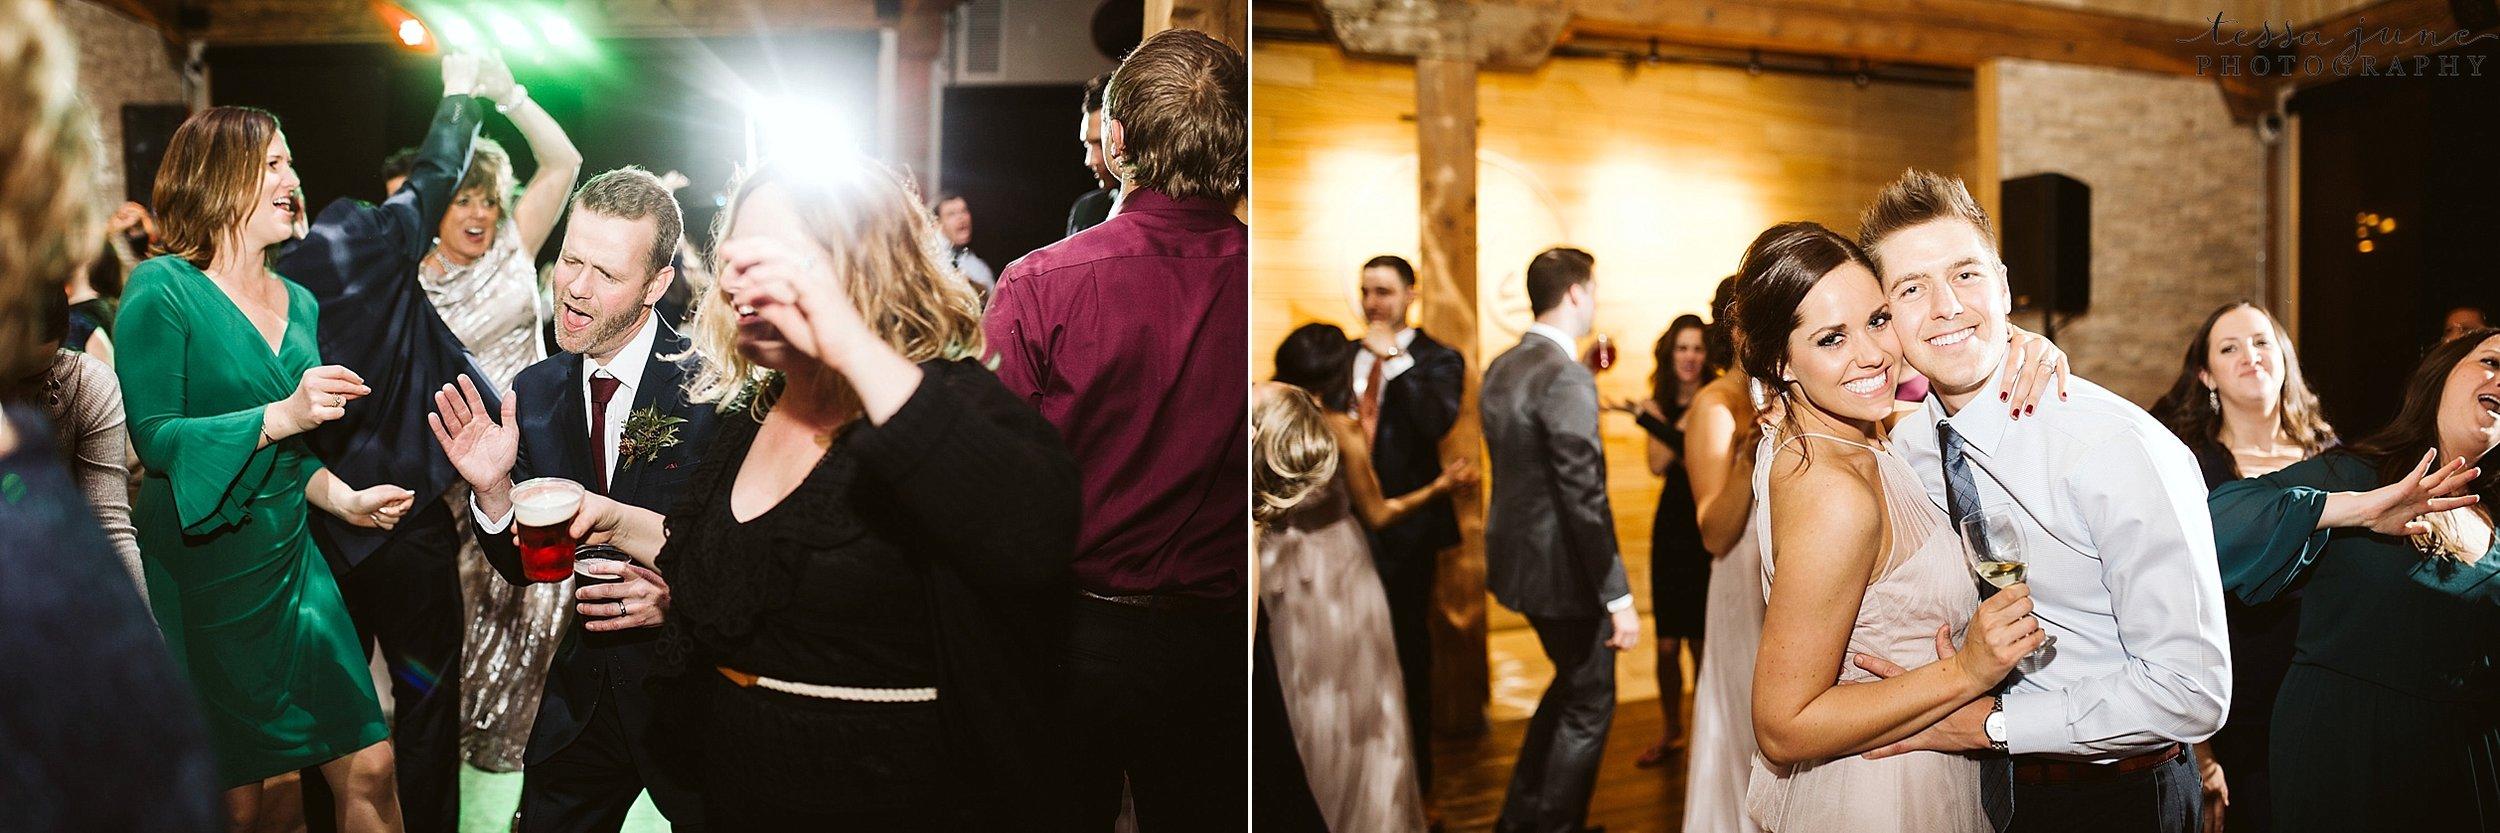 minneapolis-event-center-winter-romantic-snow-wedding-december-231.jpg